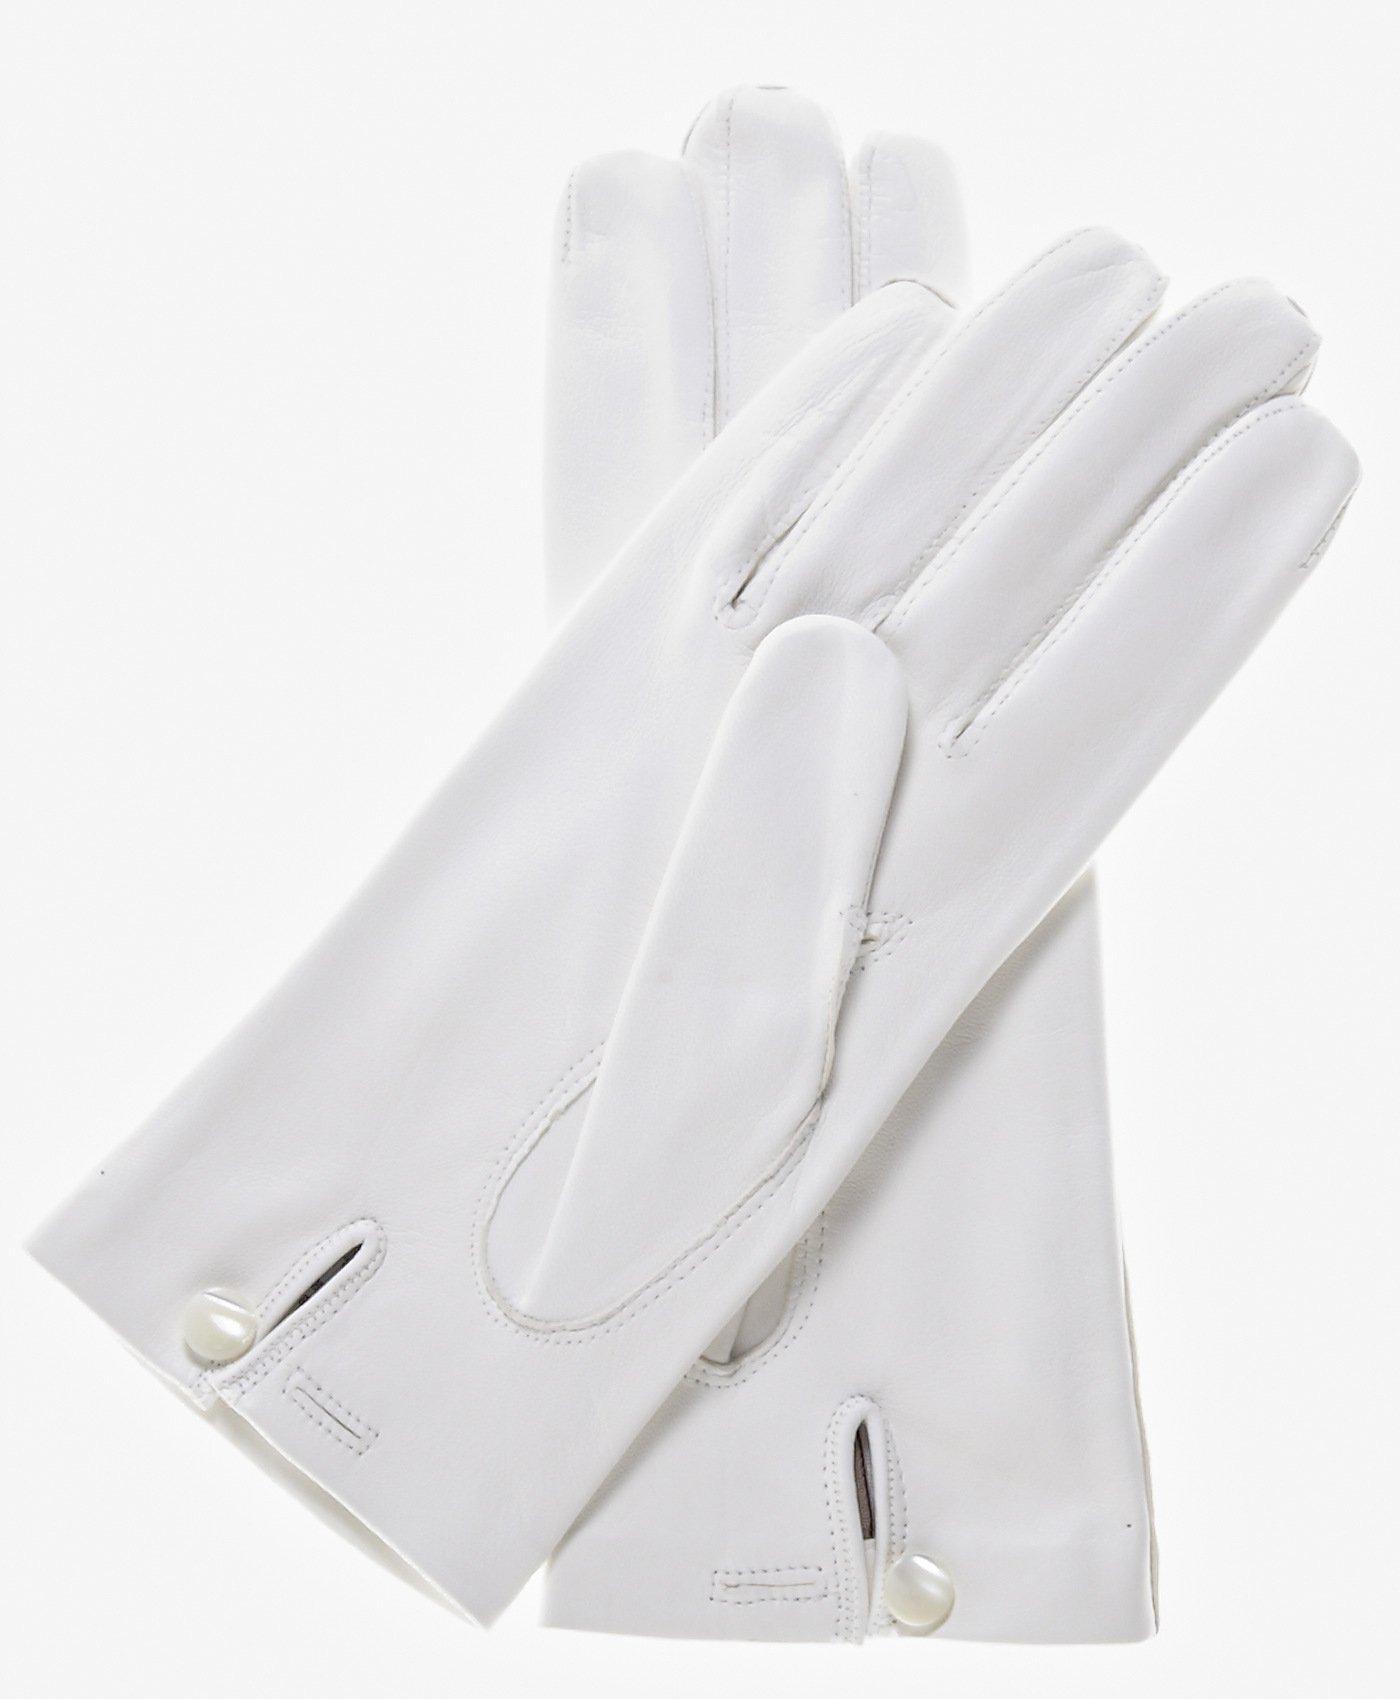 Fratelli Orsini Women's Italian Silk Lined White Leather Wedding Gloves Size 7 1/2 Color White by Fratelli Orsini (Image #3)